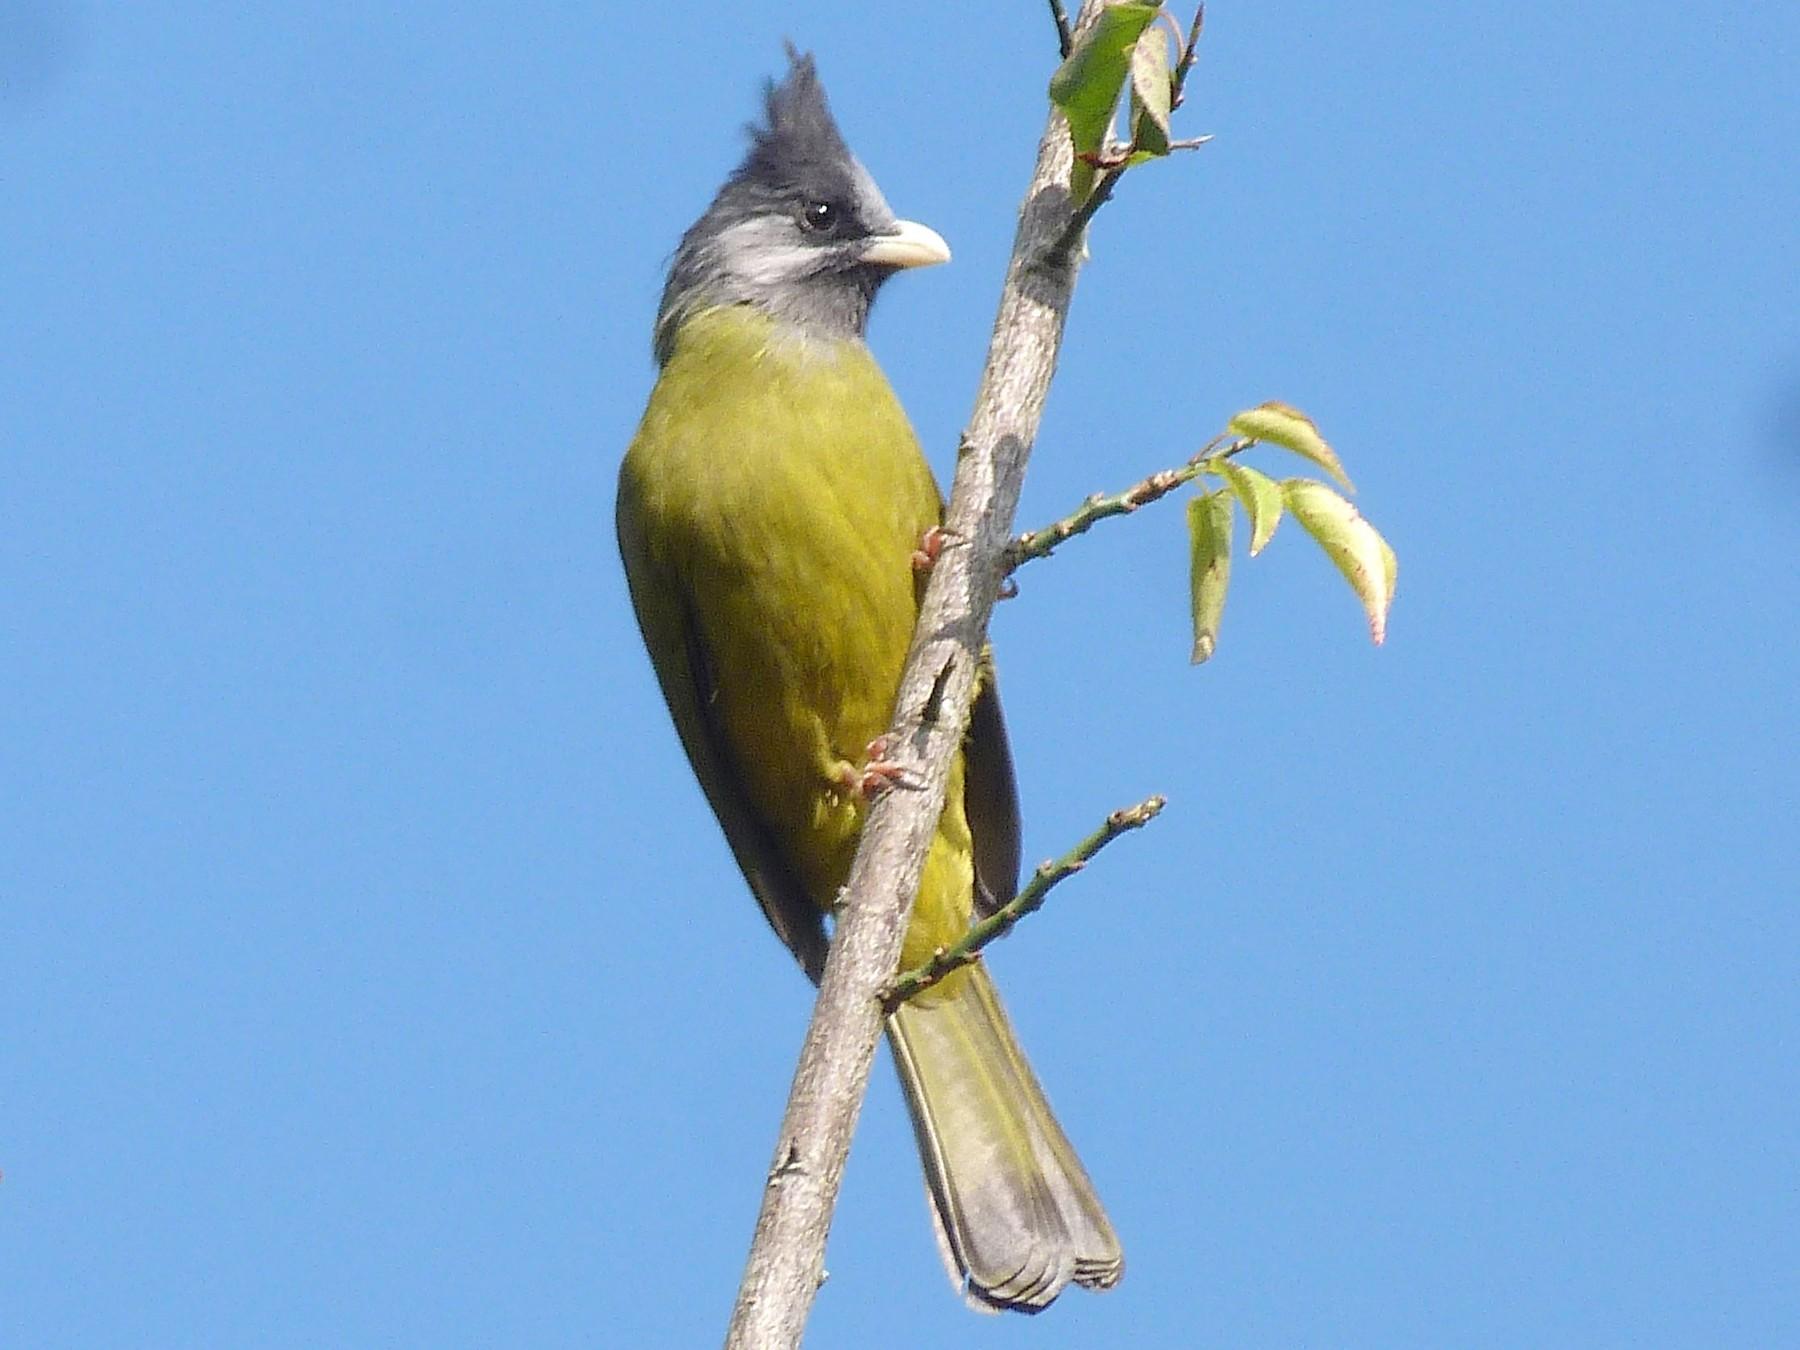 Crested Finchbill - Doug Kibbe